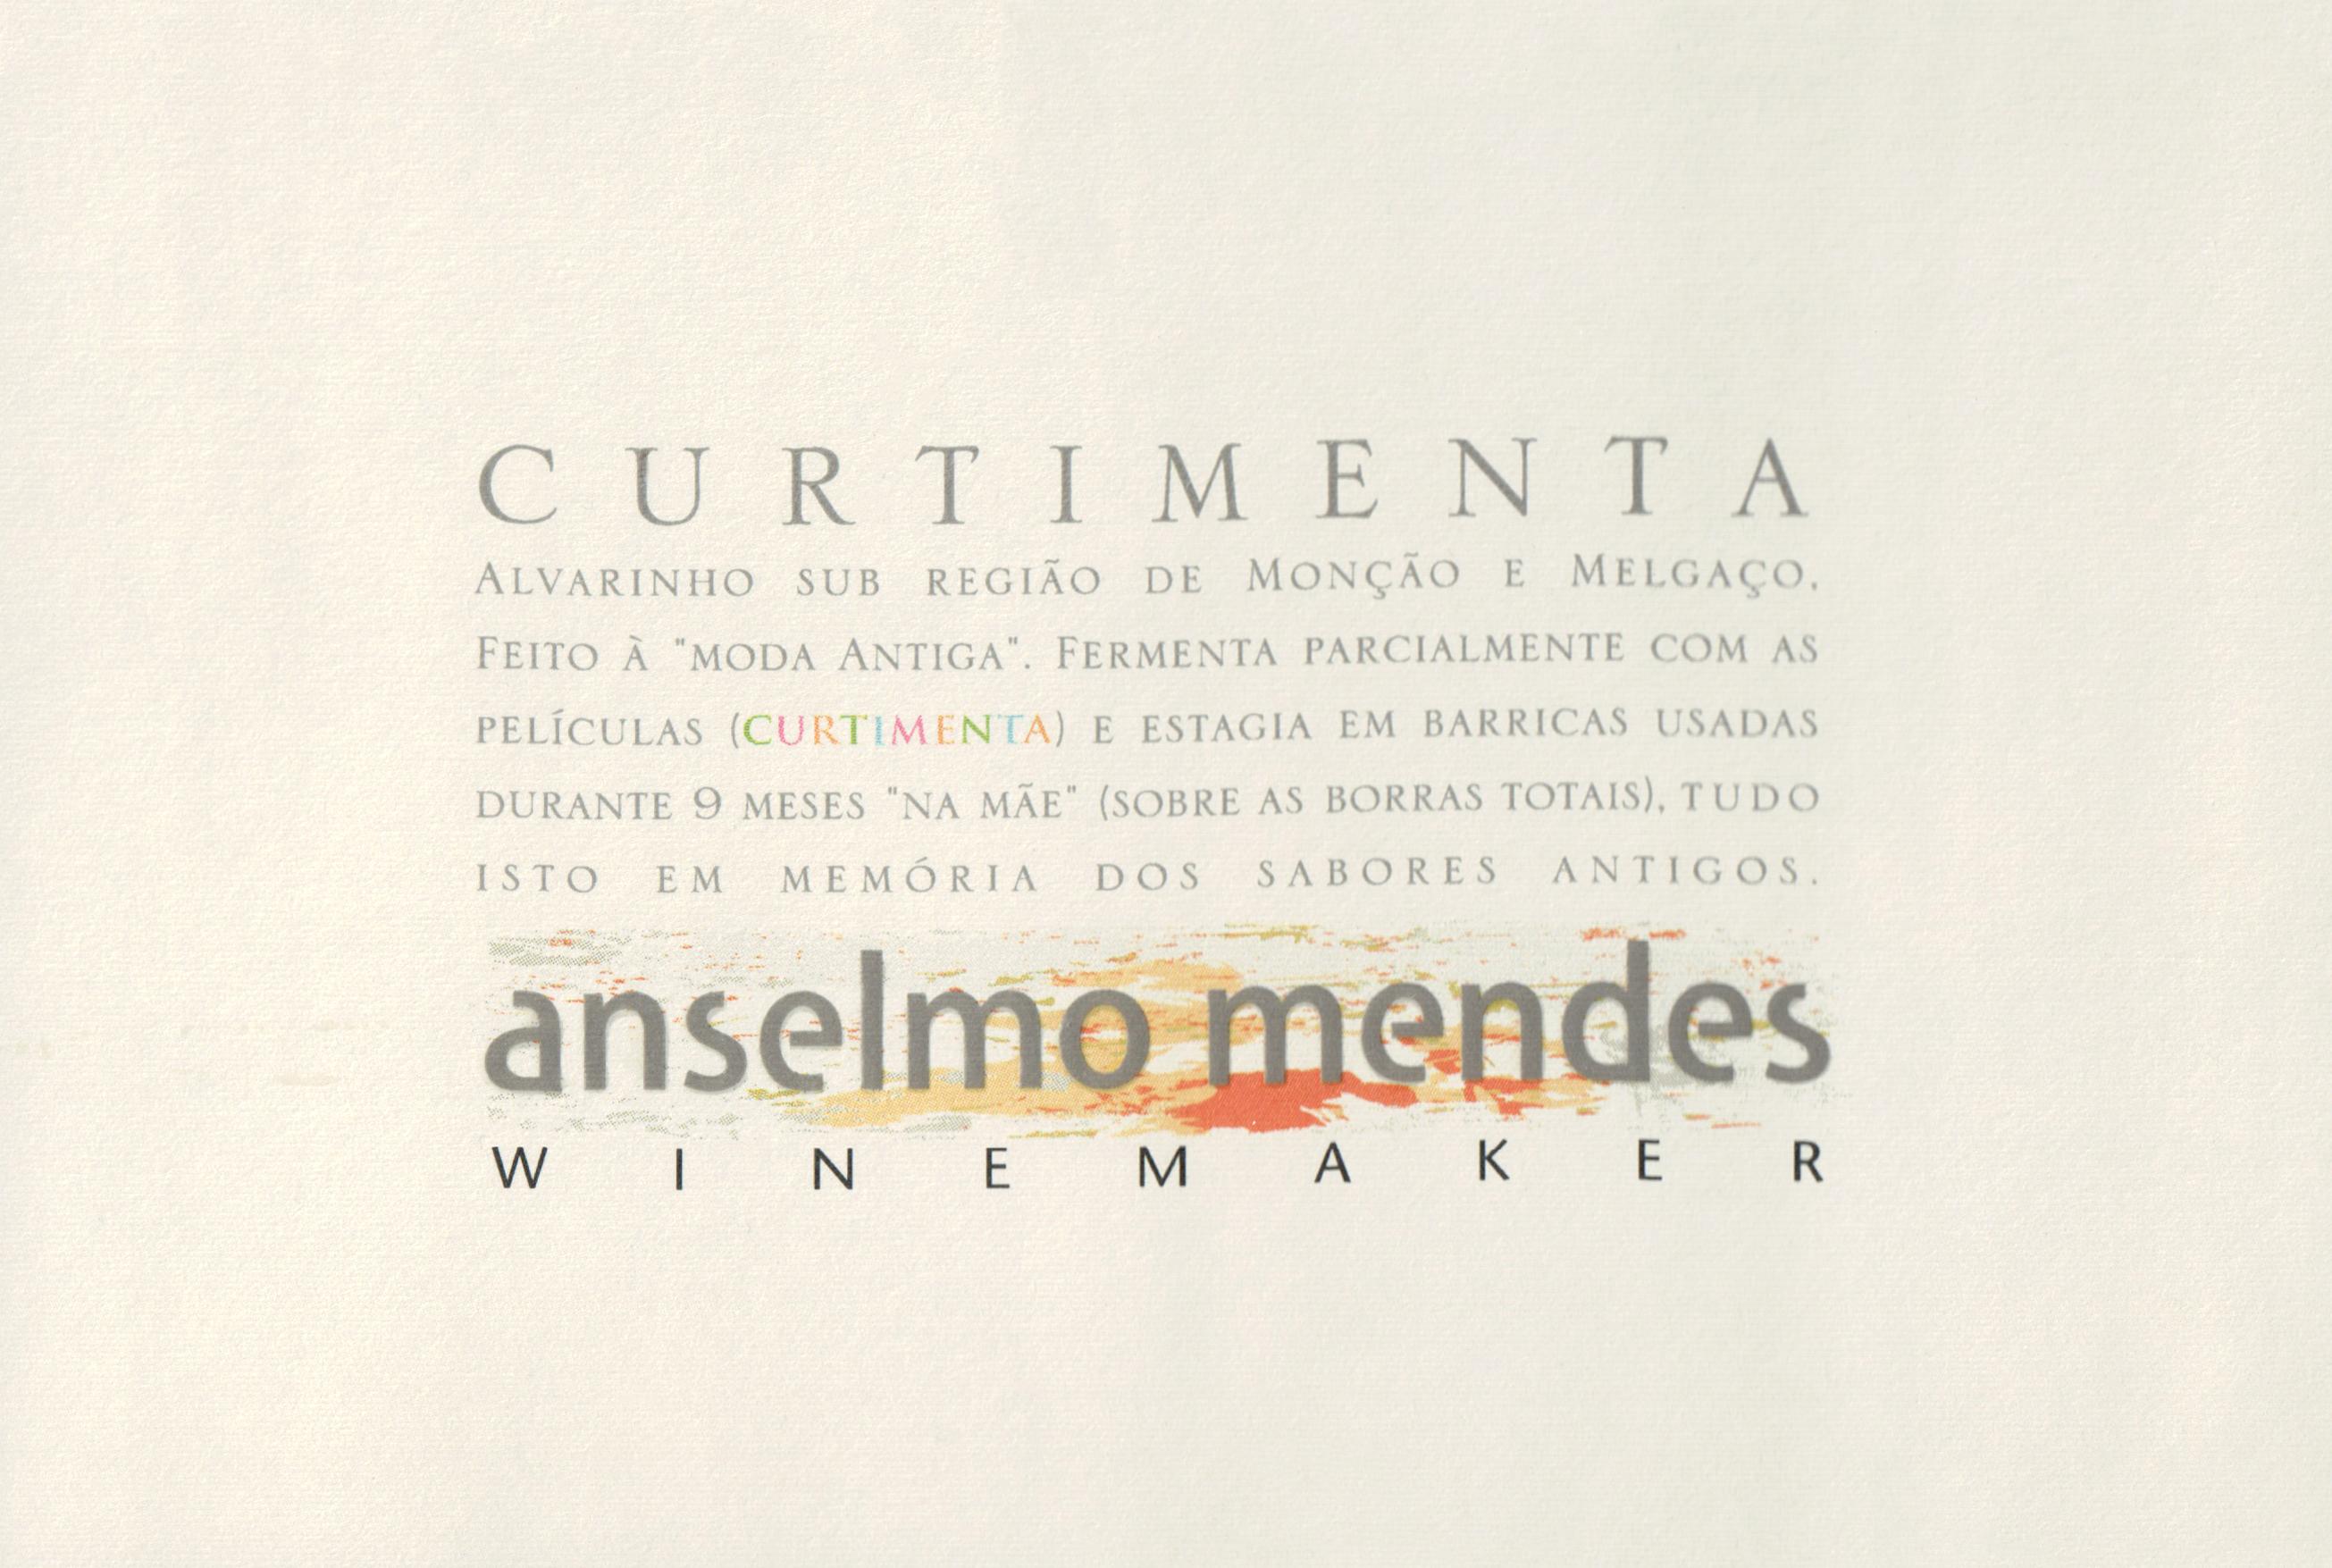 Anselmo Mendes Curtimenta 2016